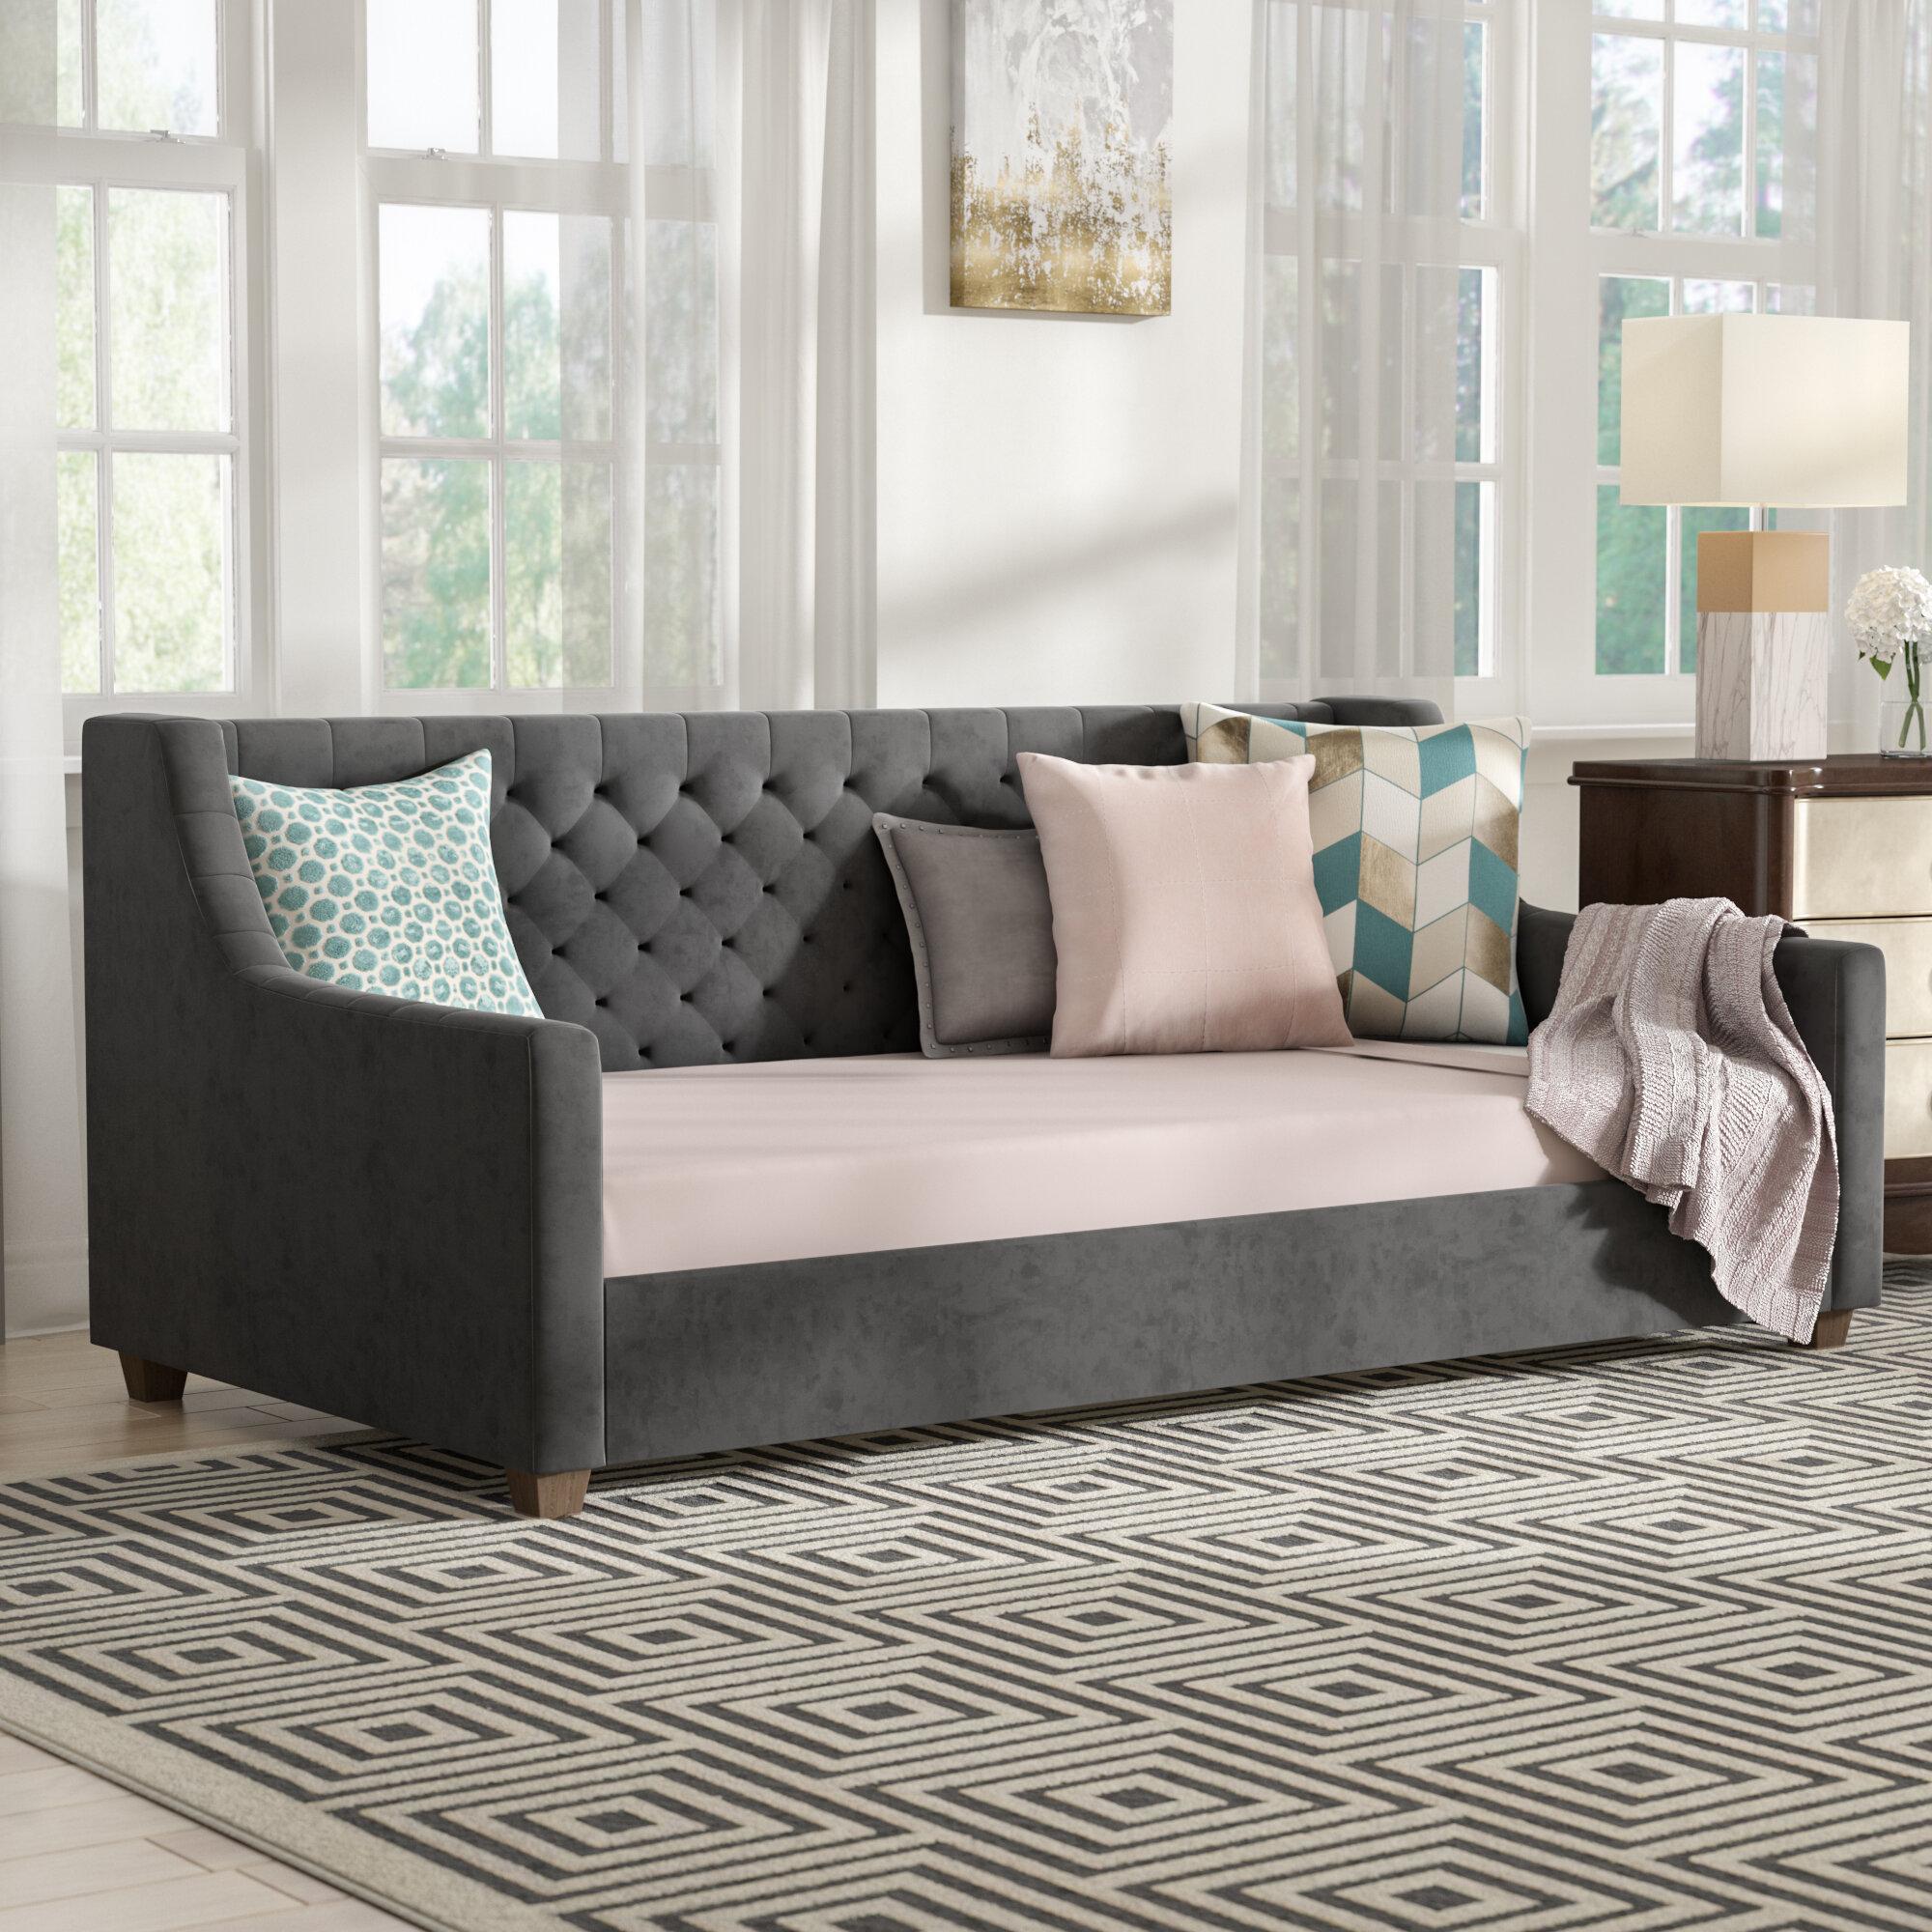 Willa Arlo Interiors Pihu Upholstered Twin Daybed Reviews Wayfair